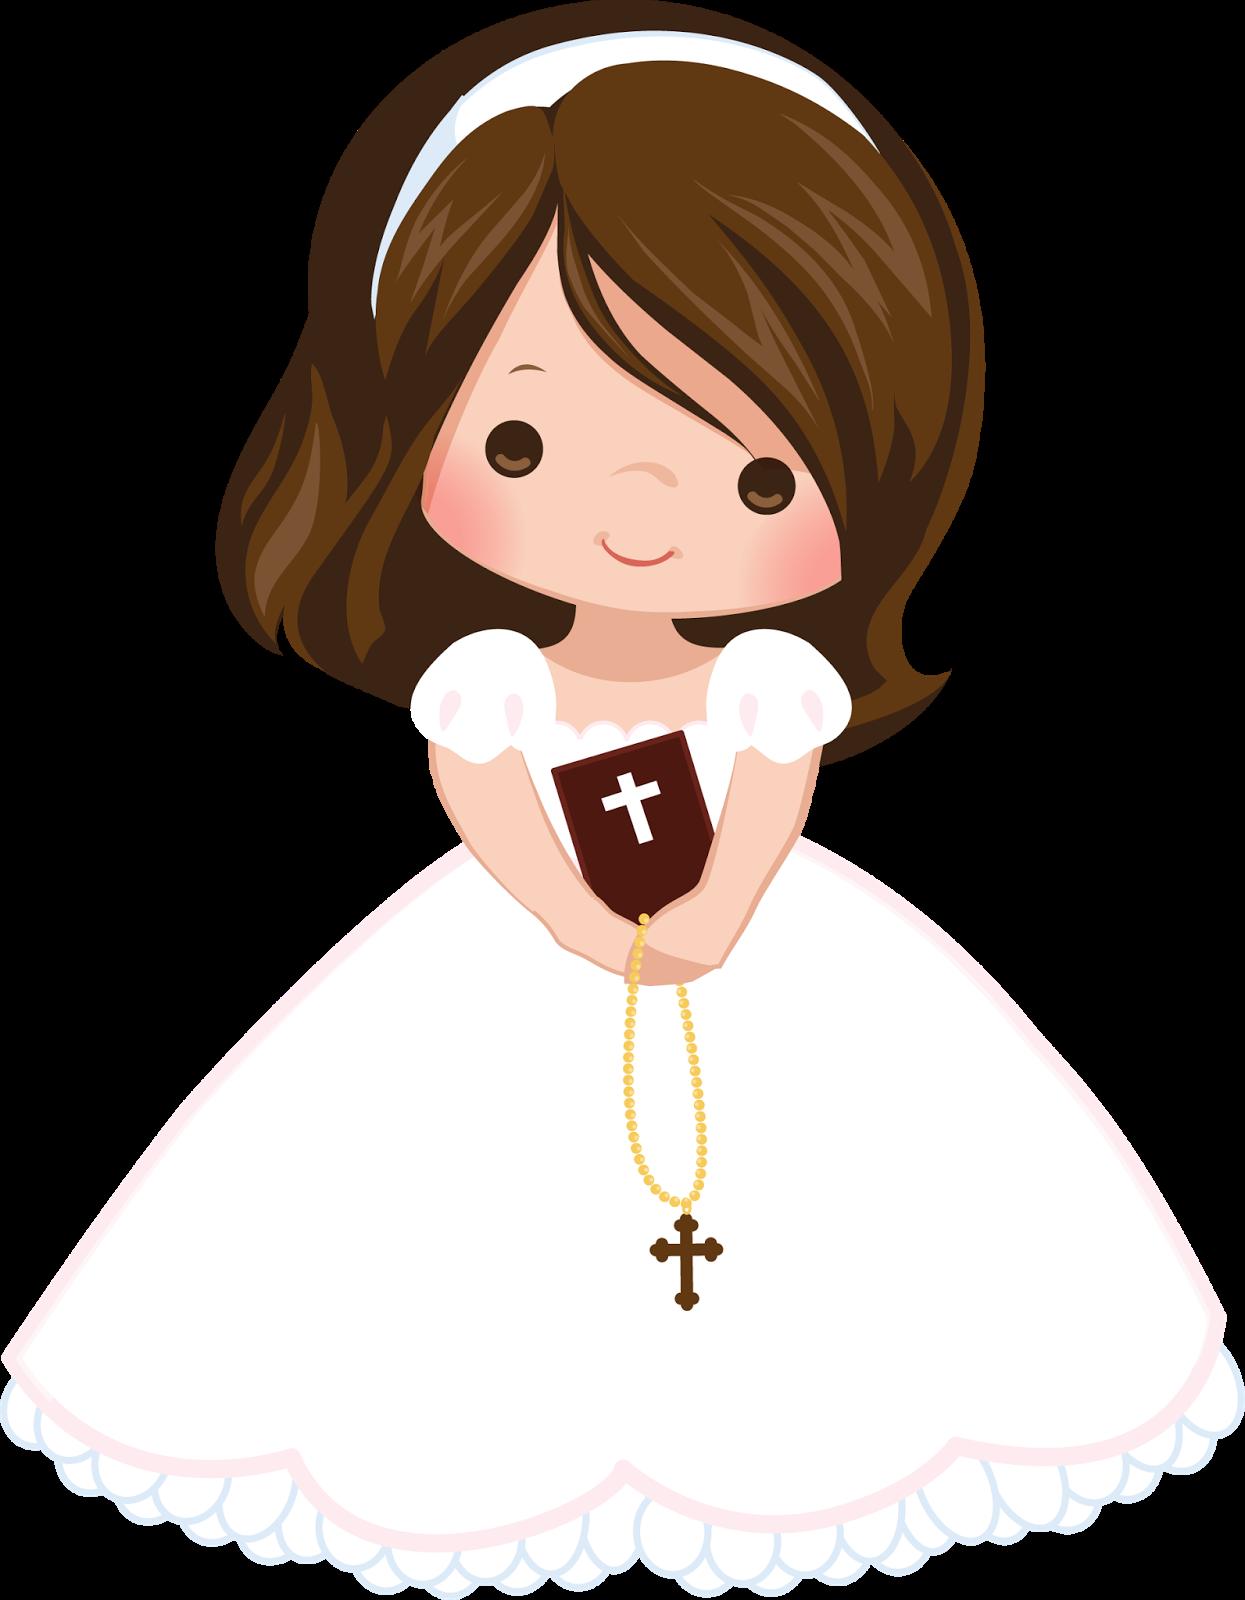 Wedding flower girl clipart clip freeuse Pin by Jeny Chique on primera Comunión para Niñas | Pinterest ... clip freeuse